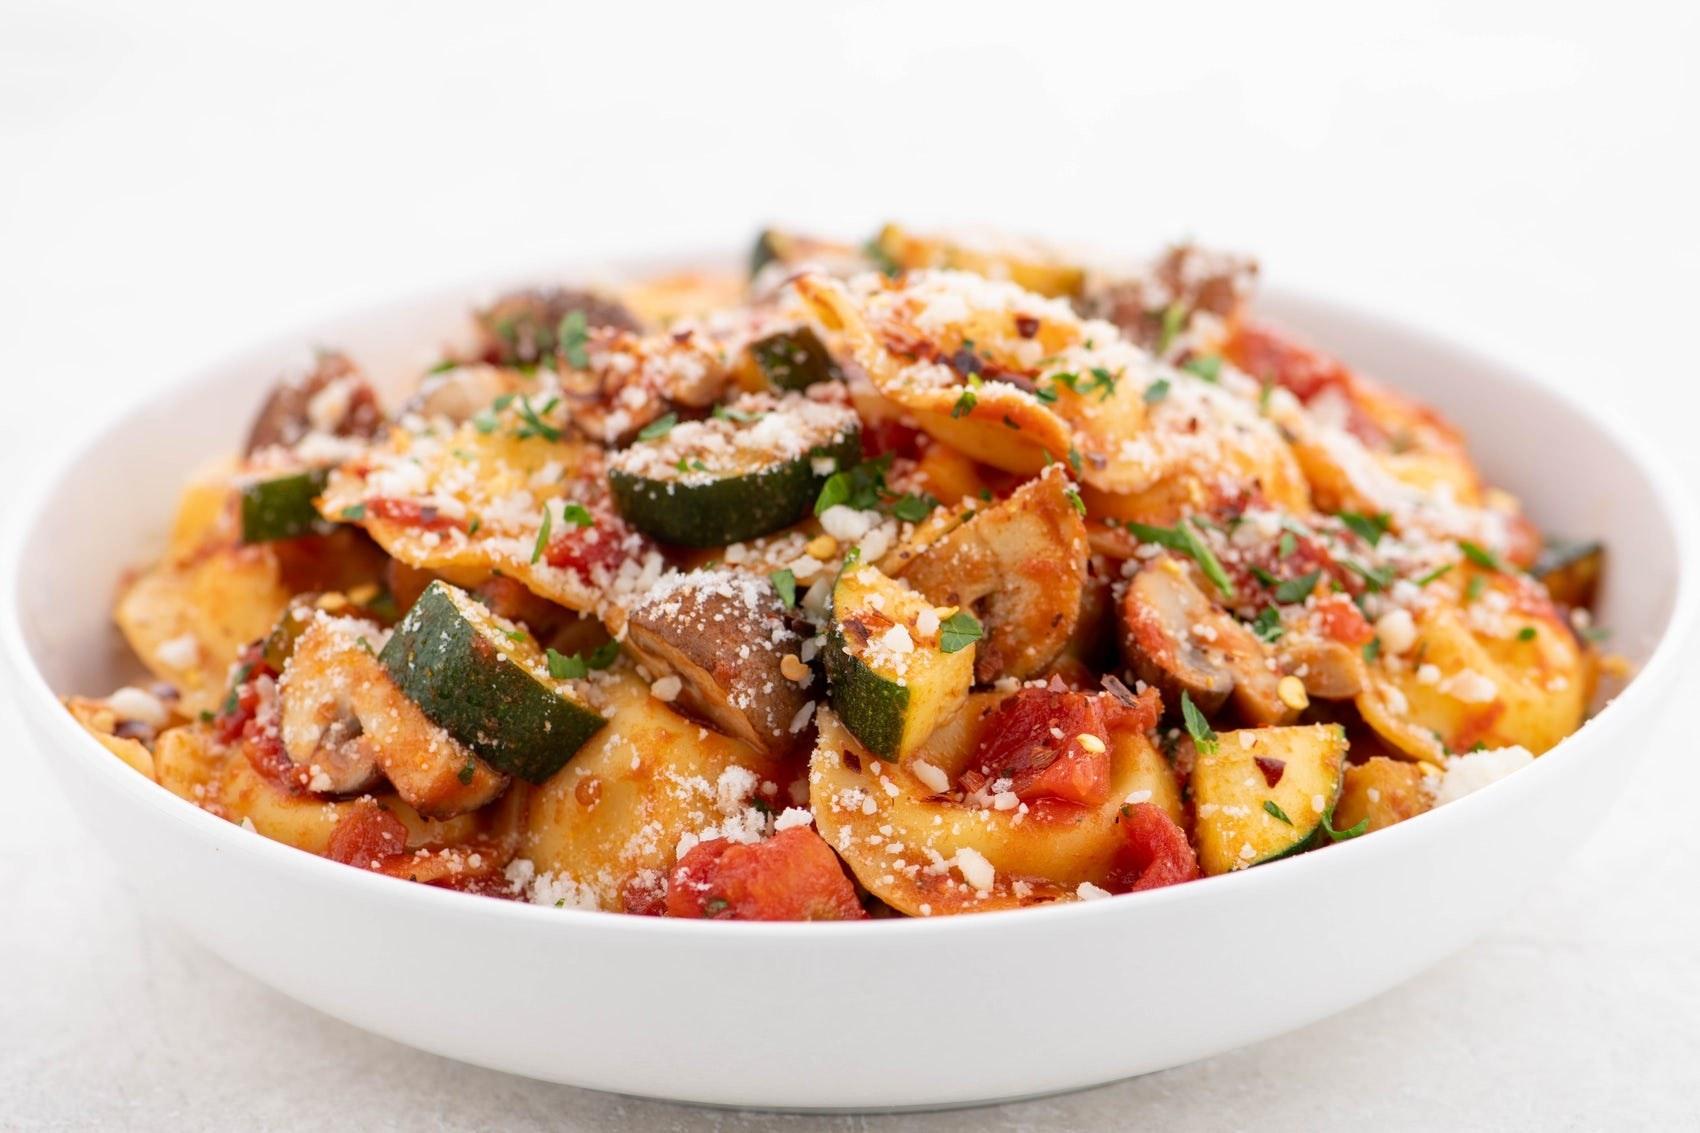 The cheese ravioli and mushroom marinara dish